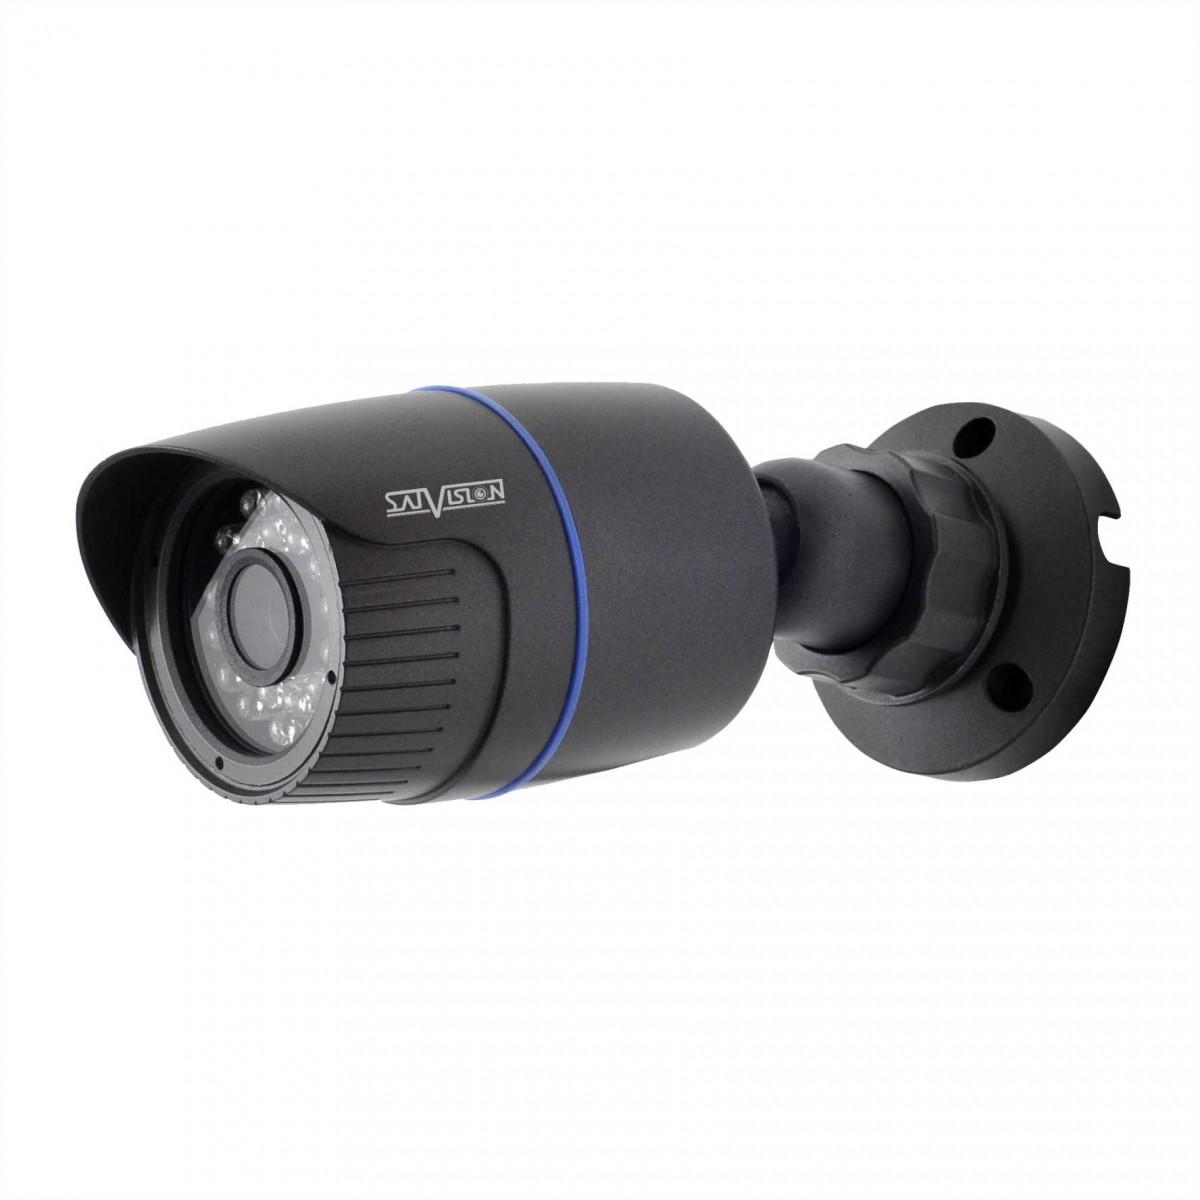 Уличная видеокамера Satvision SVC-S192 SL 2Мп 3.6мм OSD